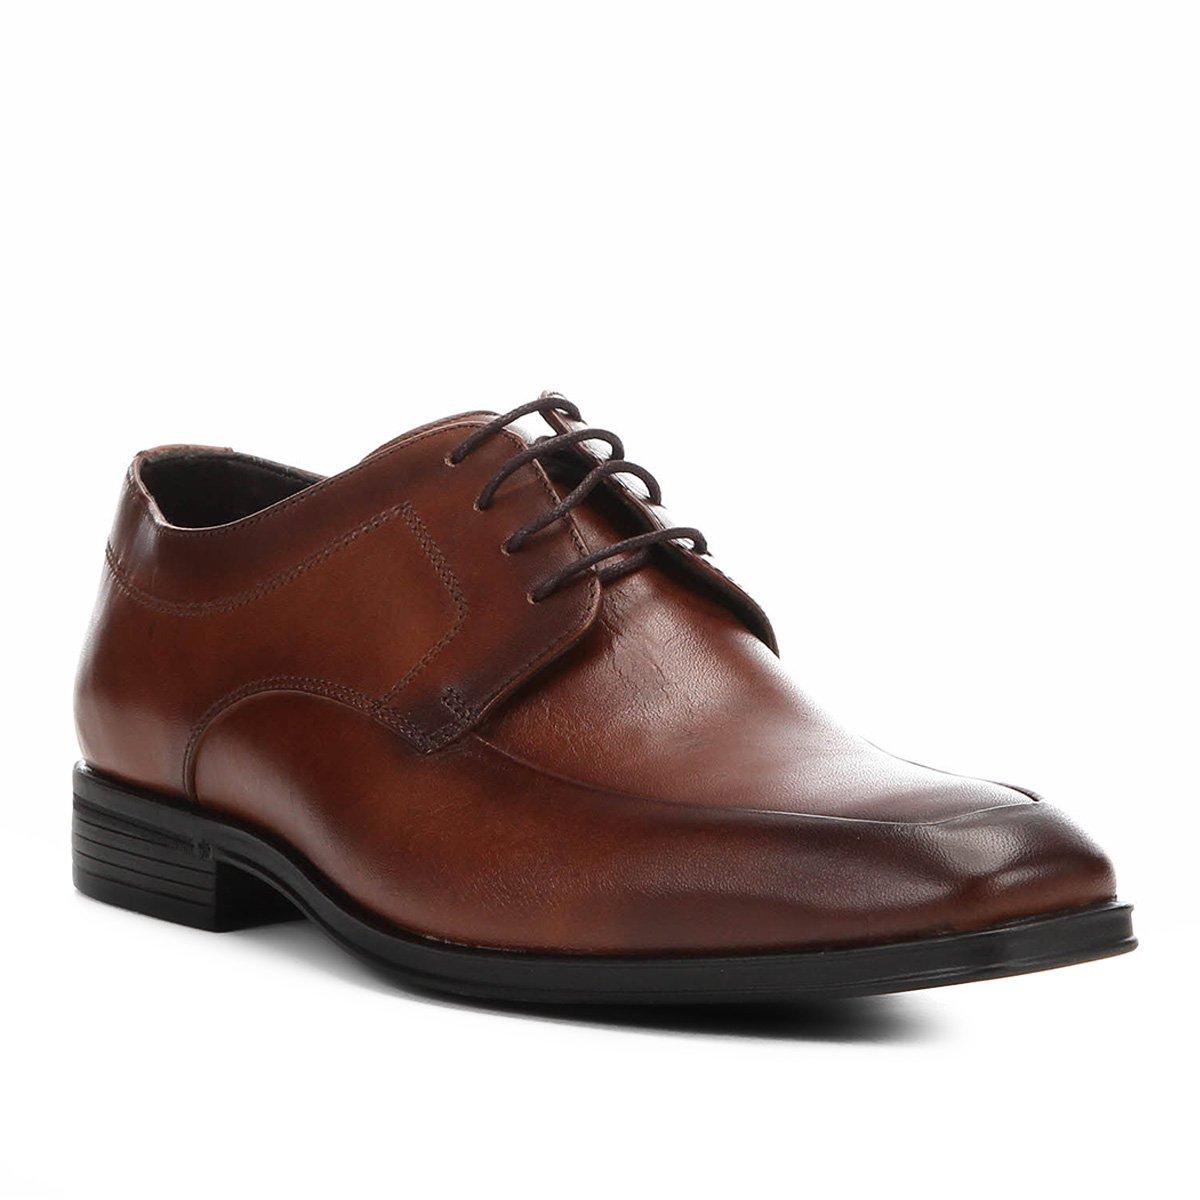 9182747c1 Sapato Social Couro Shoestock Cadarço Masculino | Shoestock